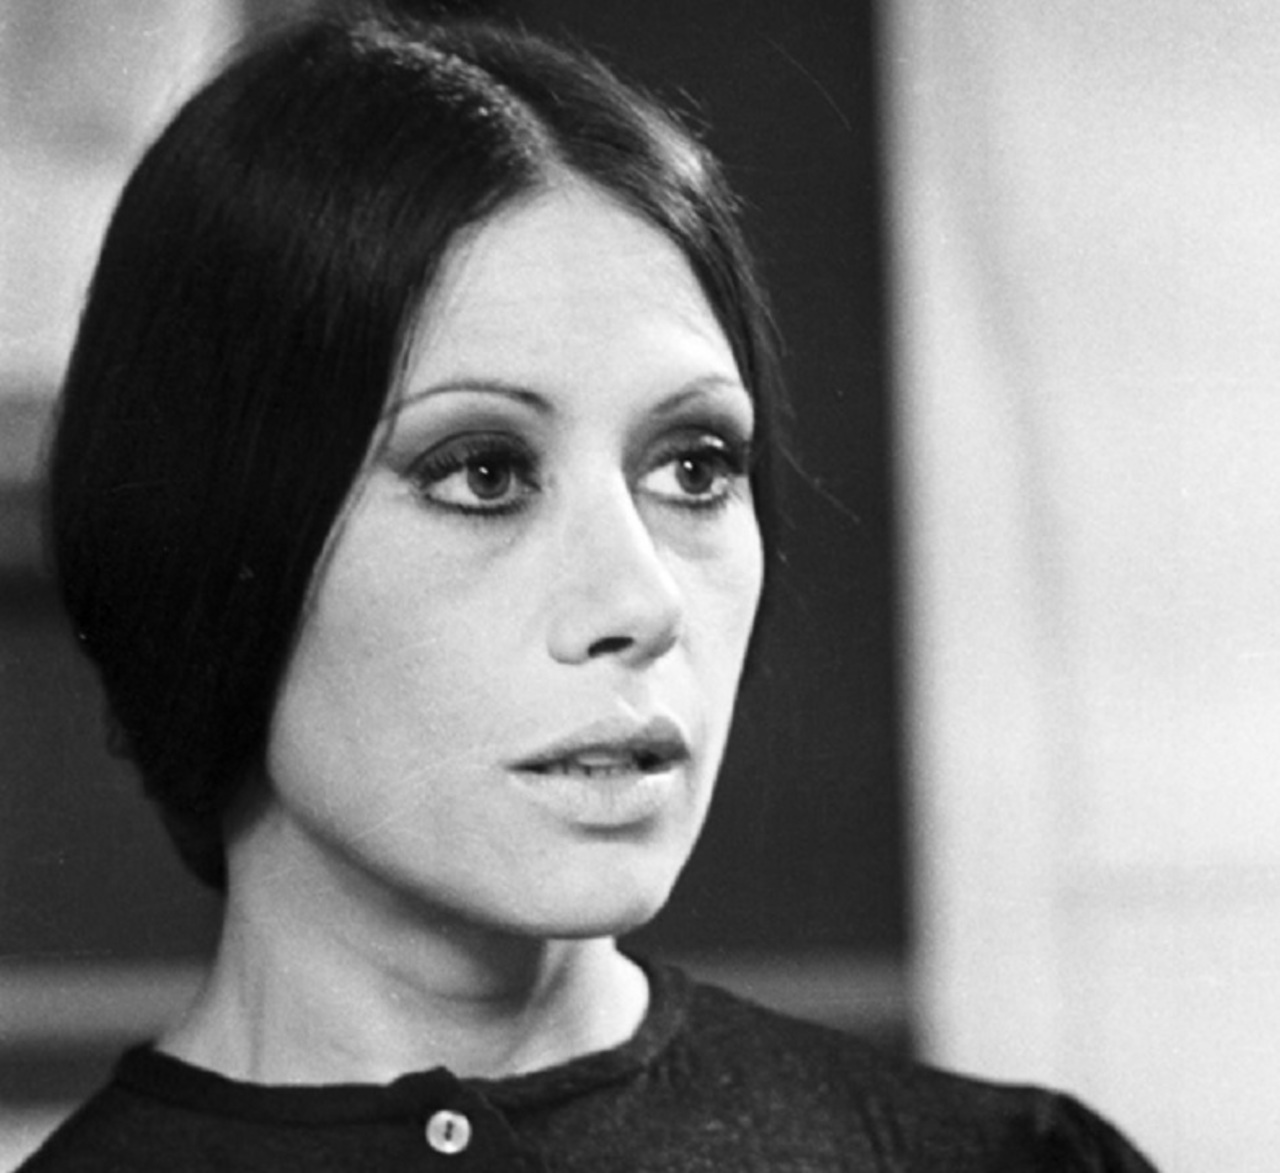 fabf6f4100 02. Dina Sfat se tornou Fernanda em Selva de Pedra (1972)